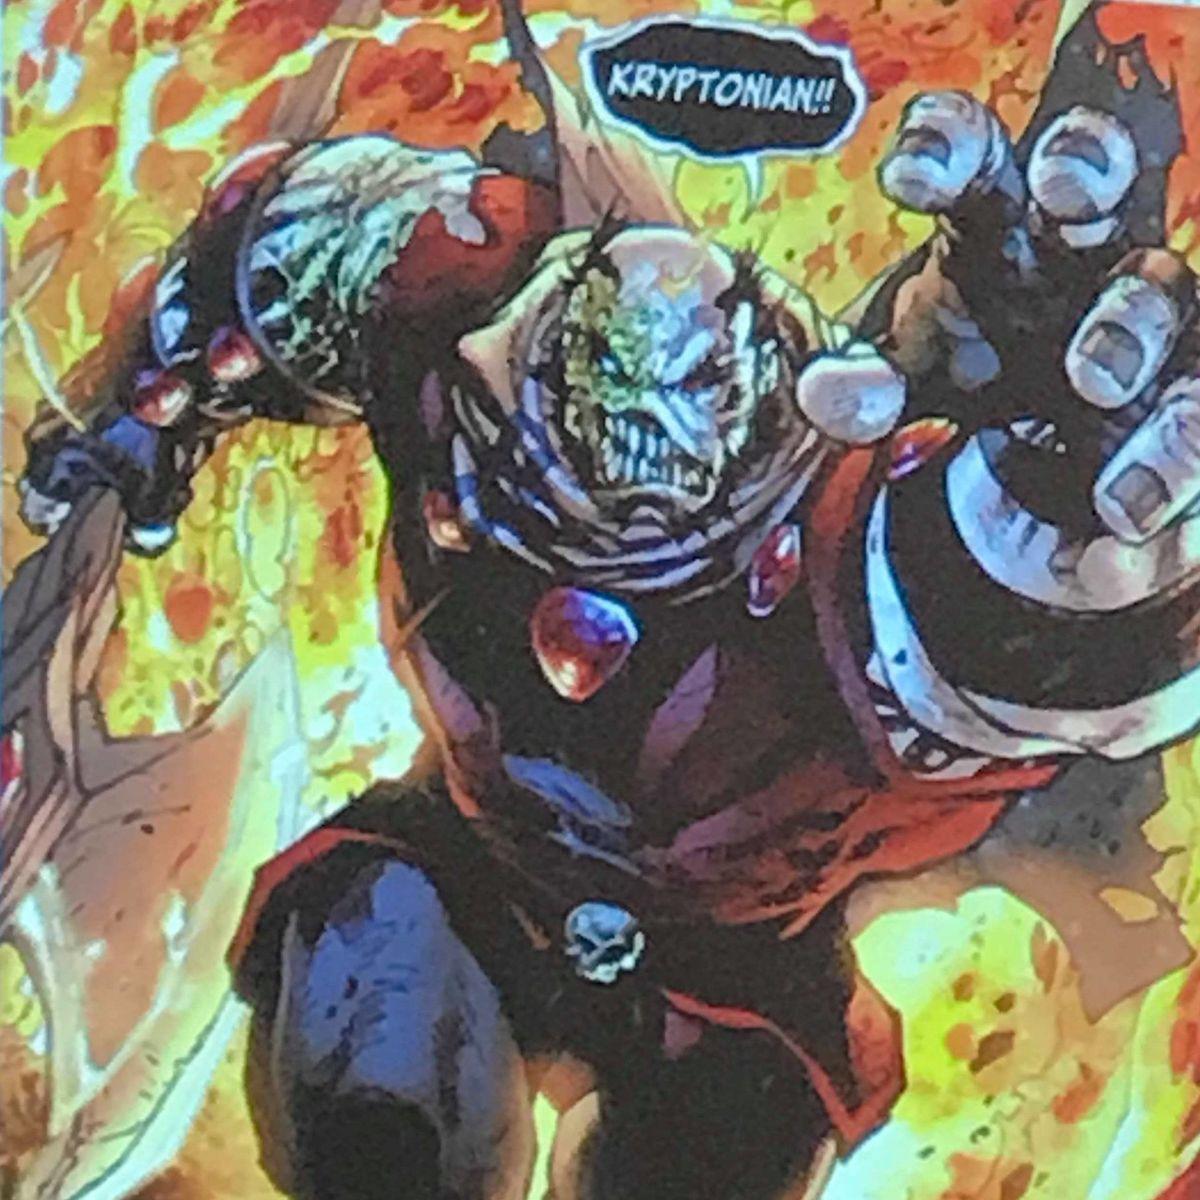 Action comics 1000 rogel